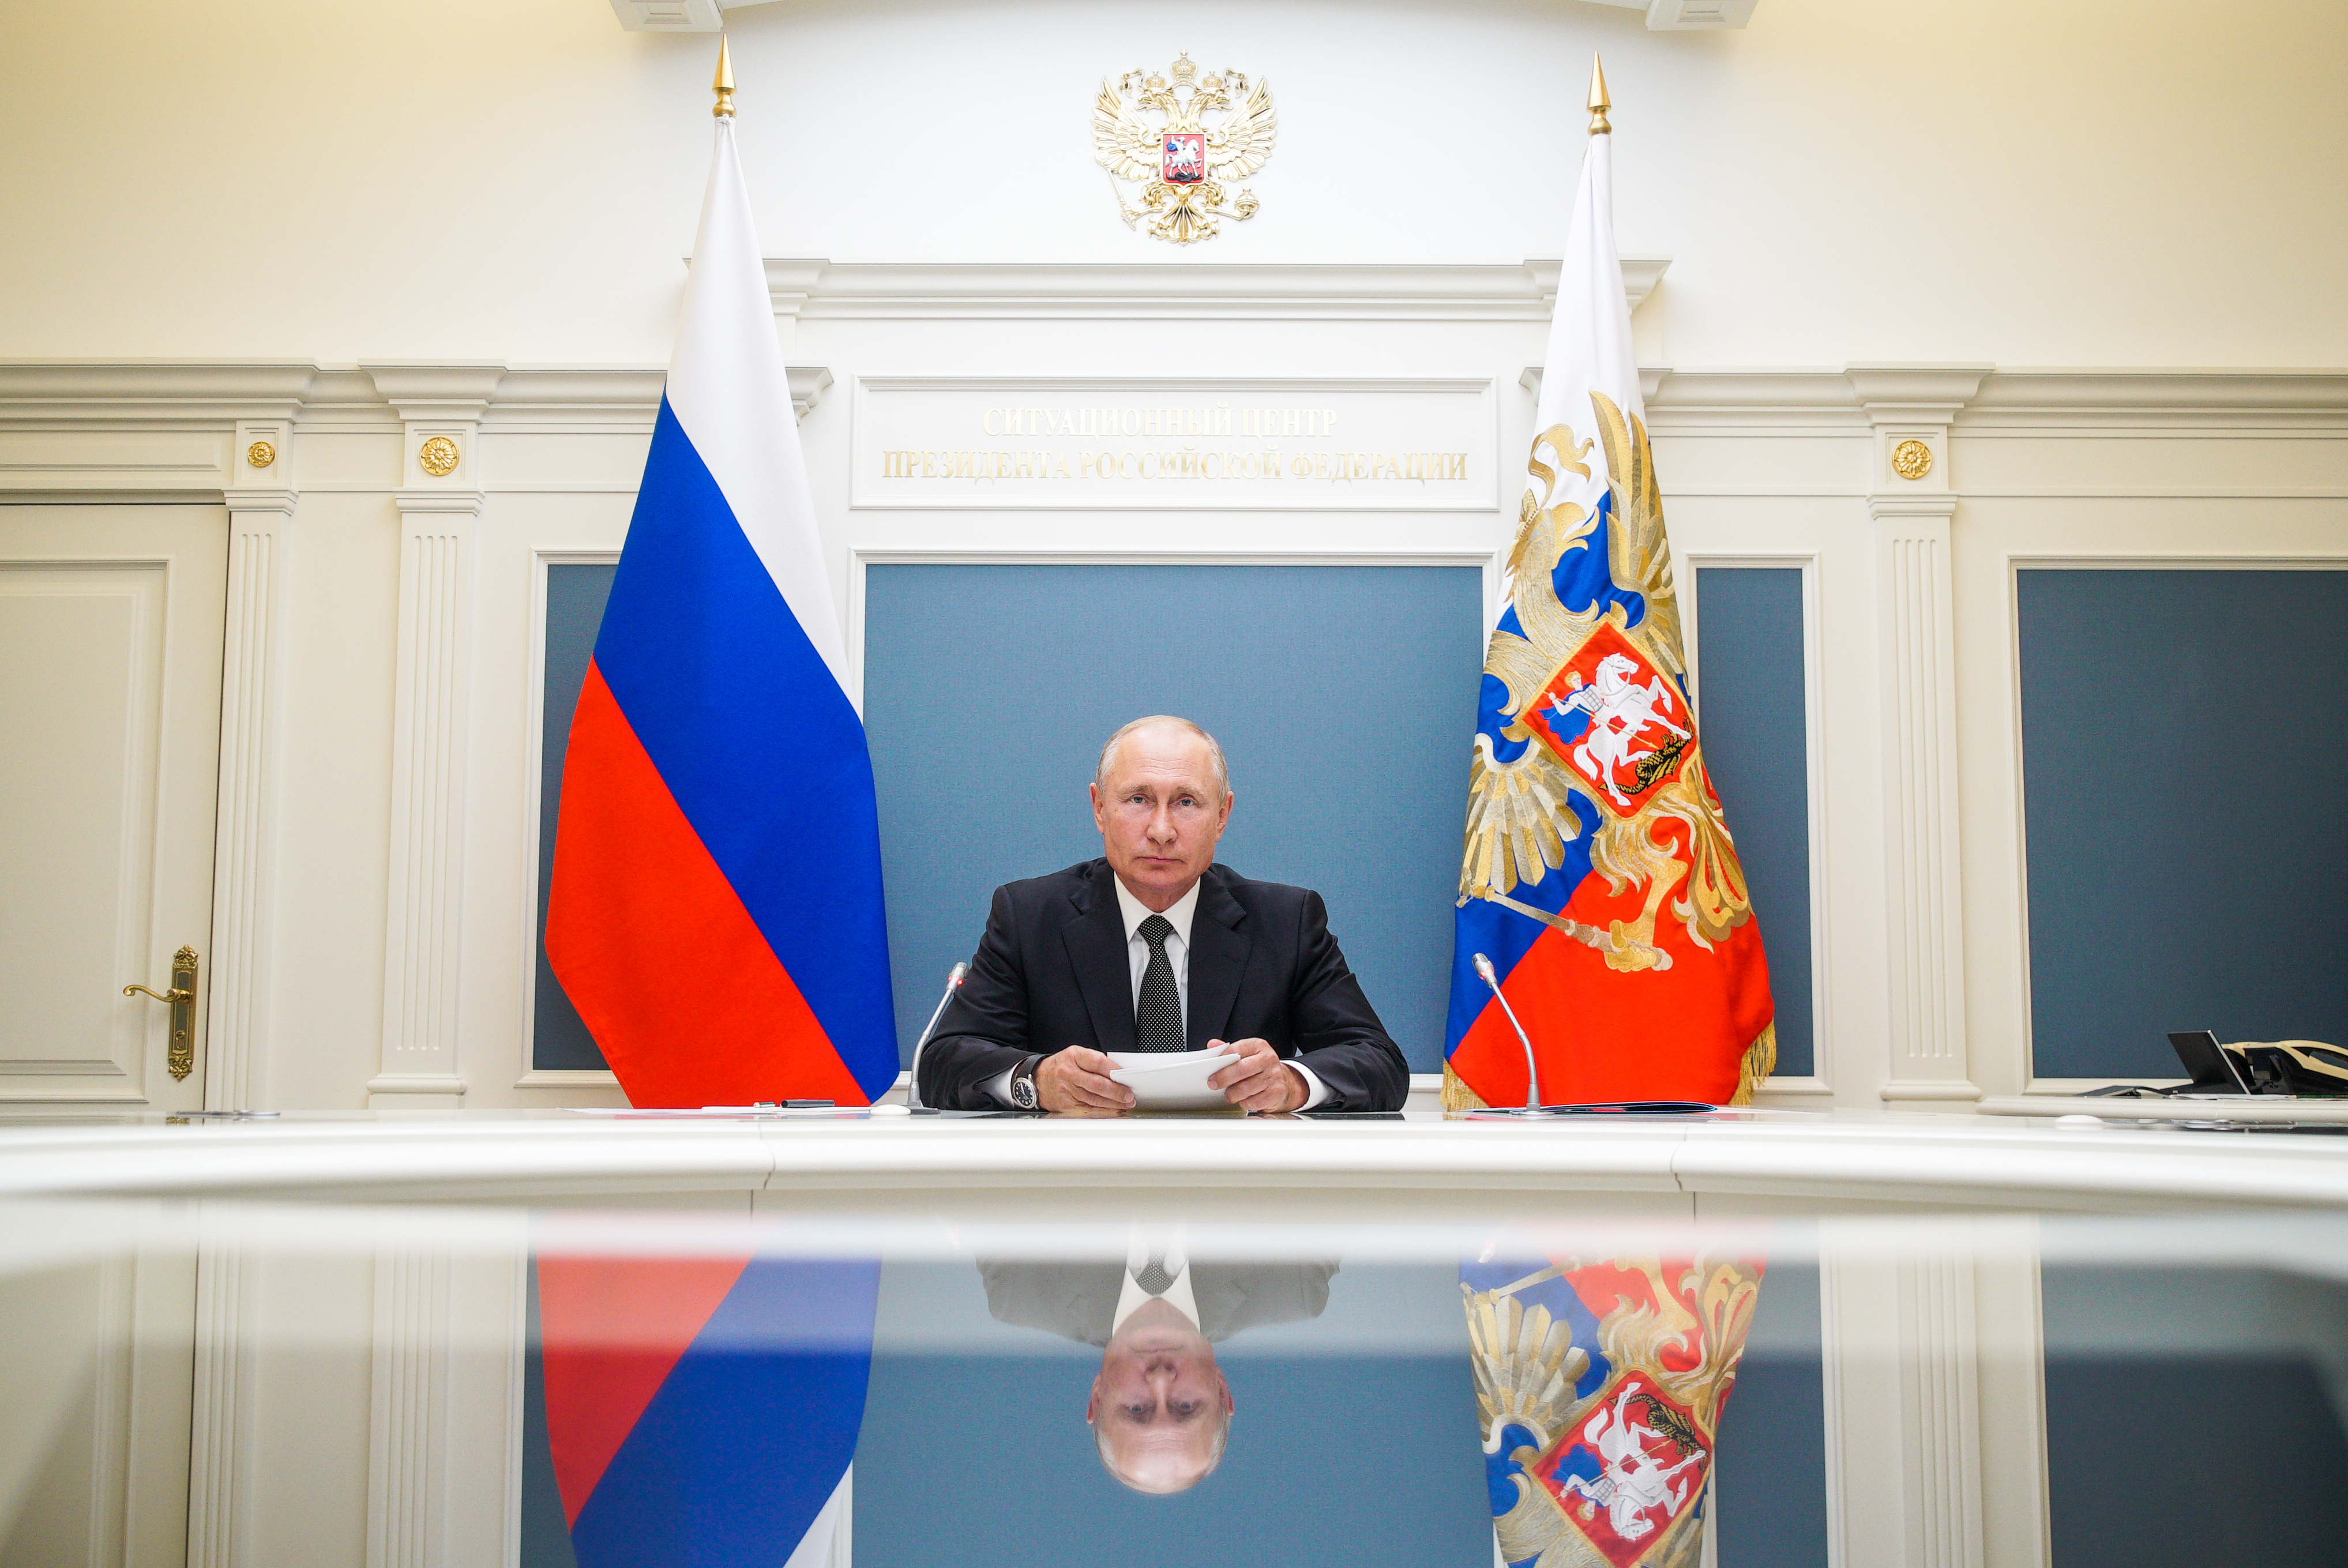 Russia's President Vladimir Putin pictured on June 30, 2020.